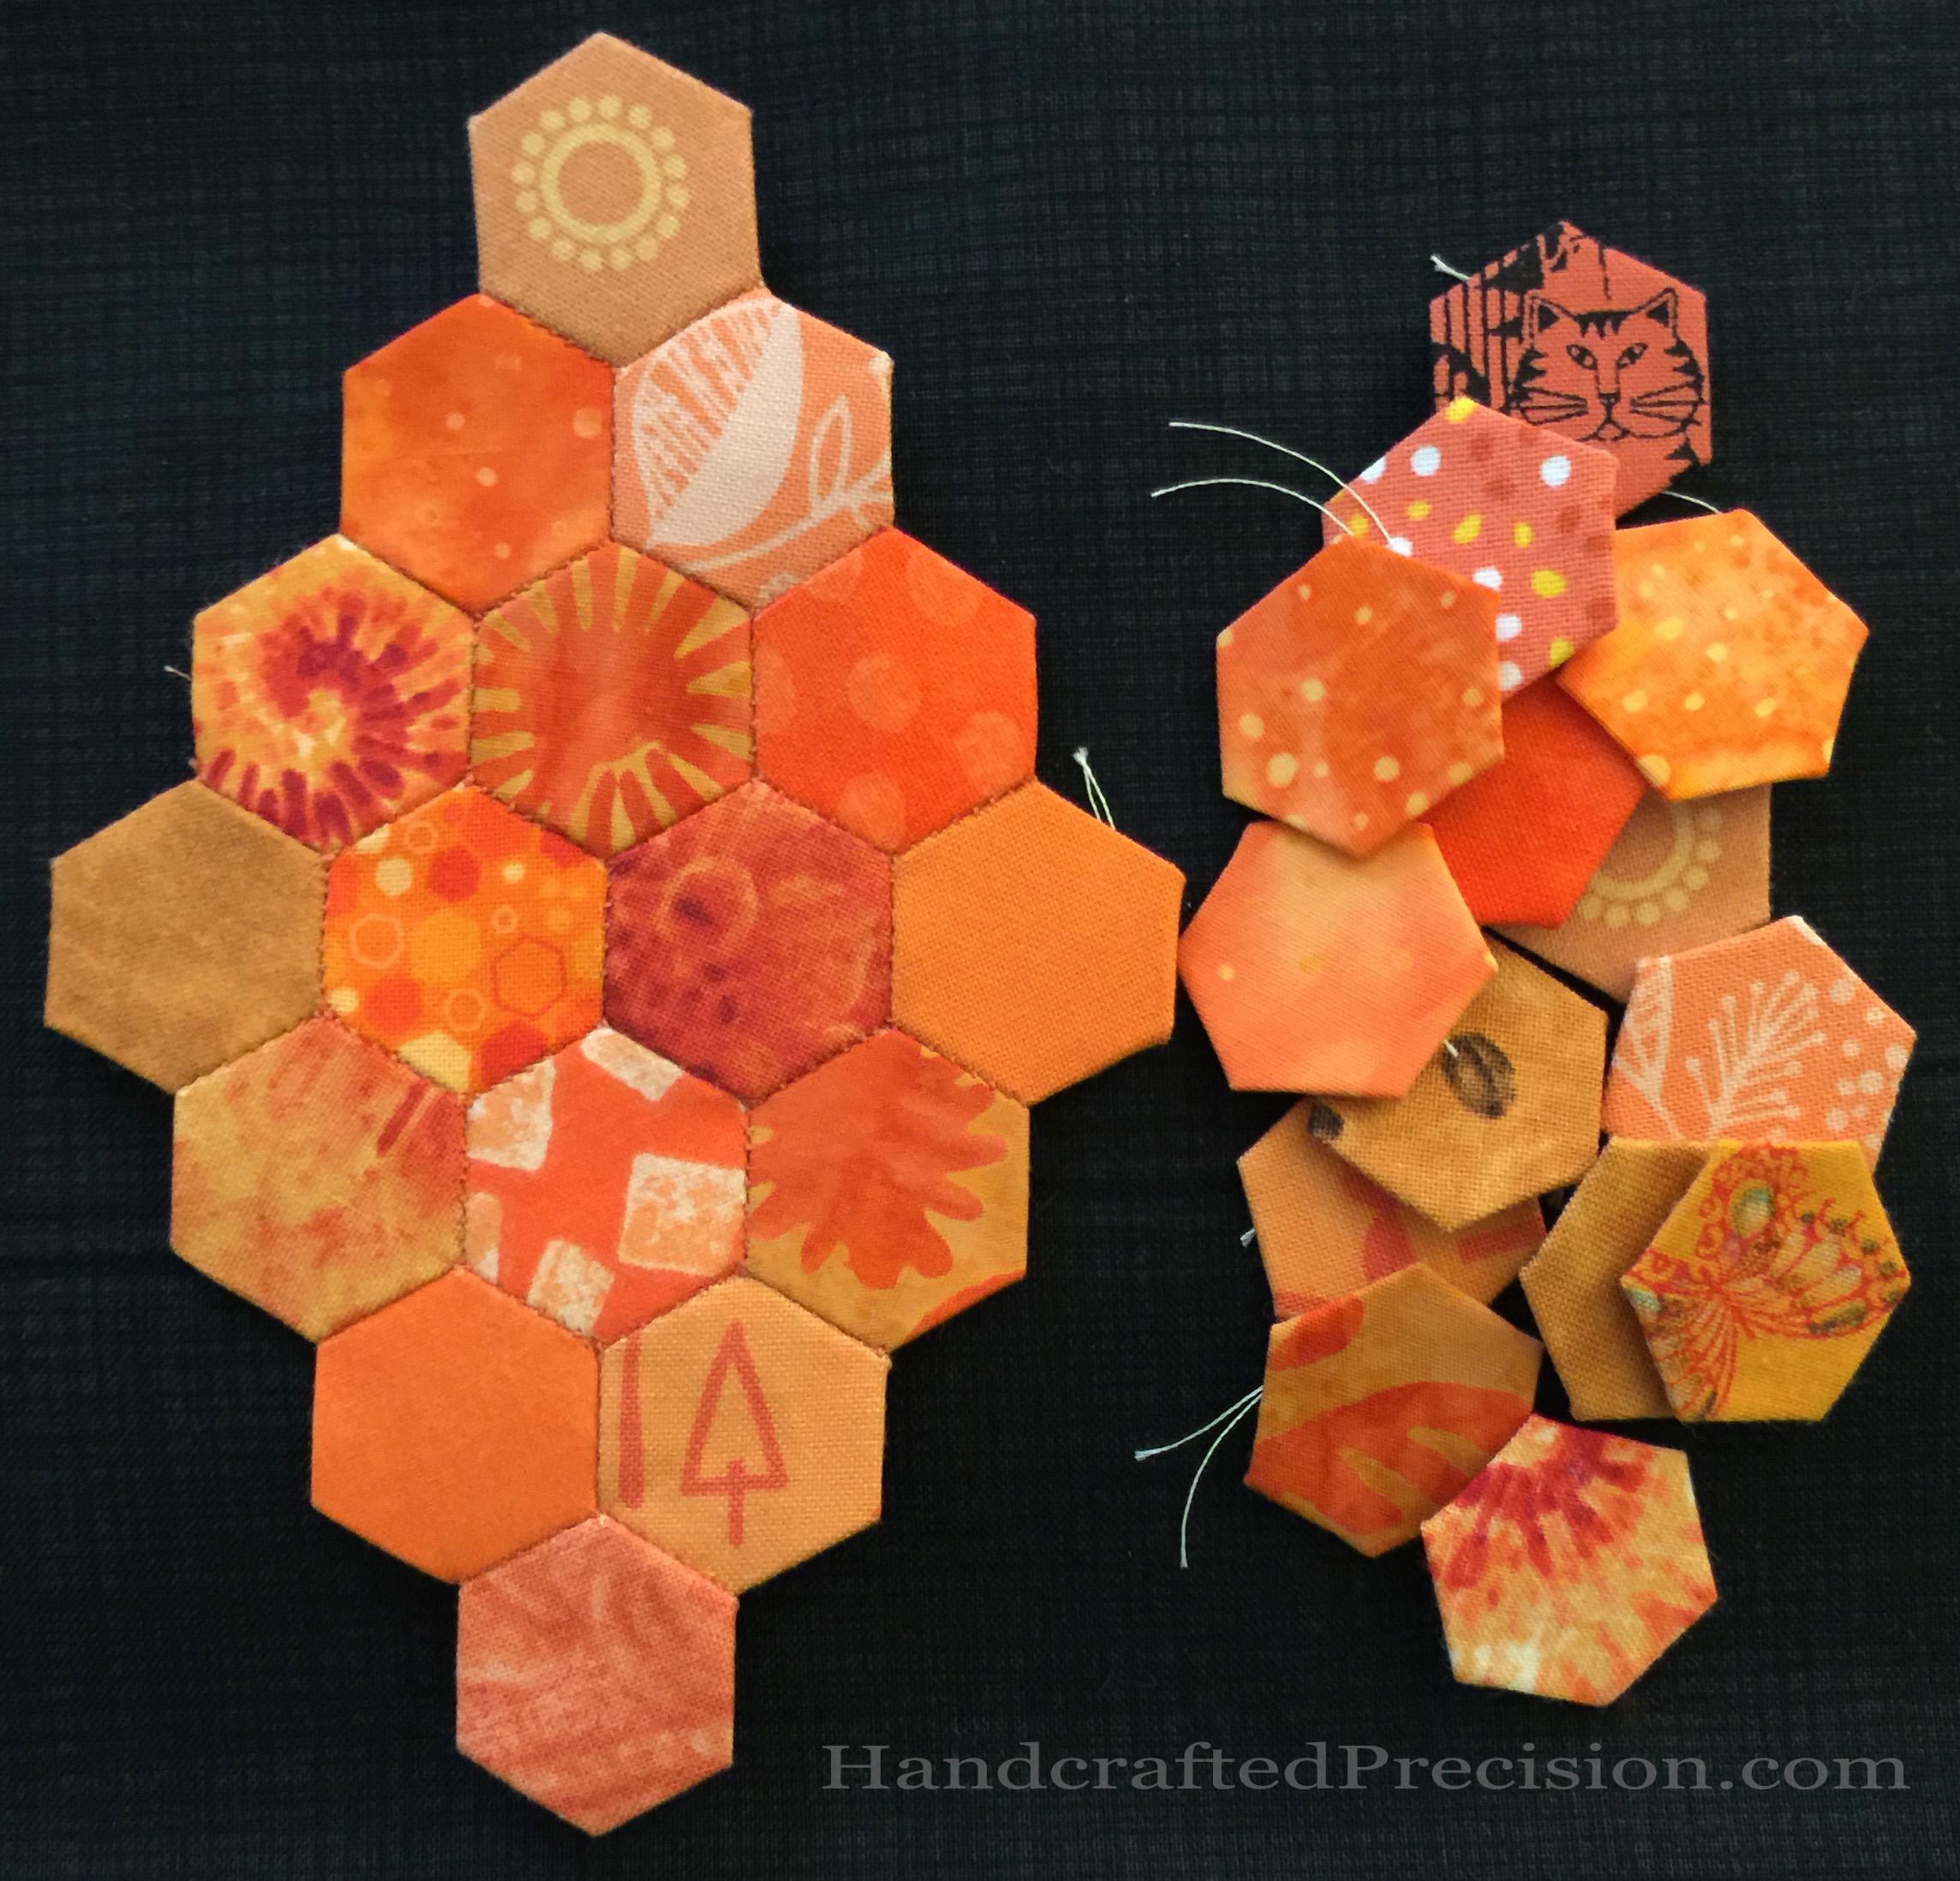 Orange Hexagon Diamond Front with Spares